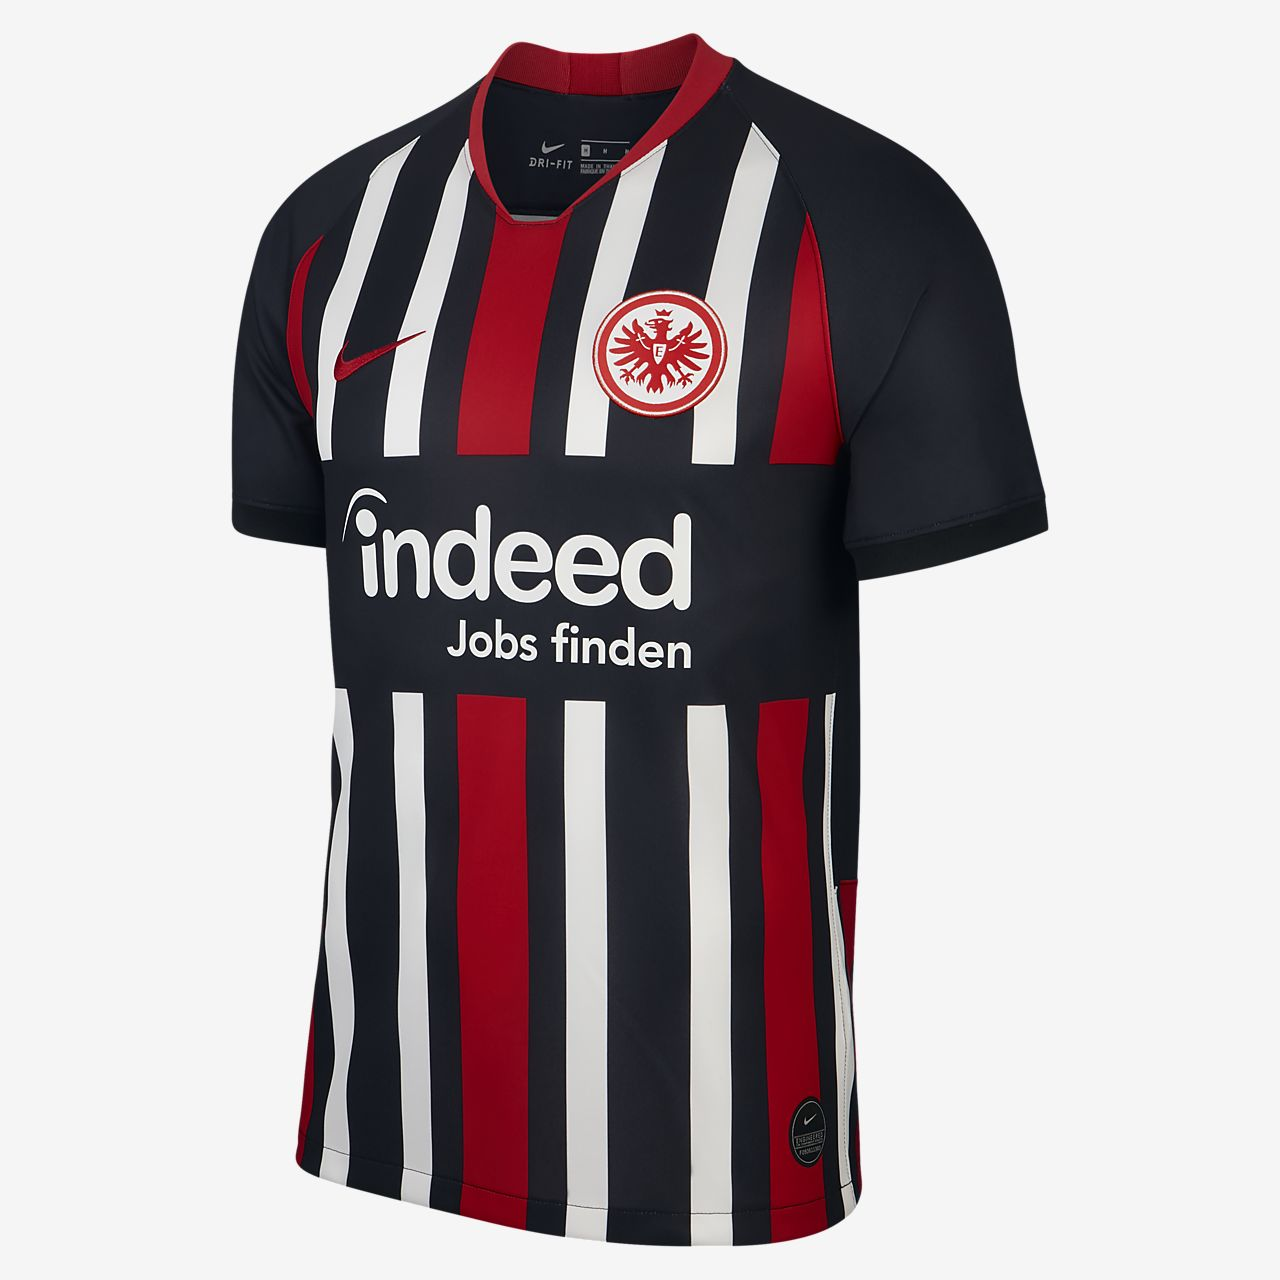 Eintracht Frankfurt 201920 Stadium Home Men's Football Shirt